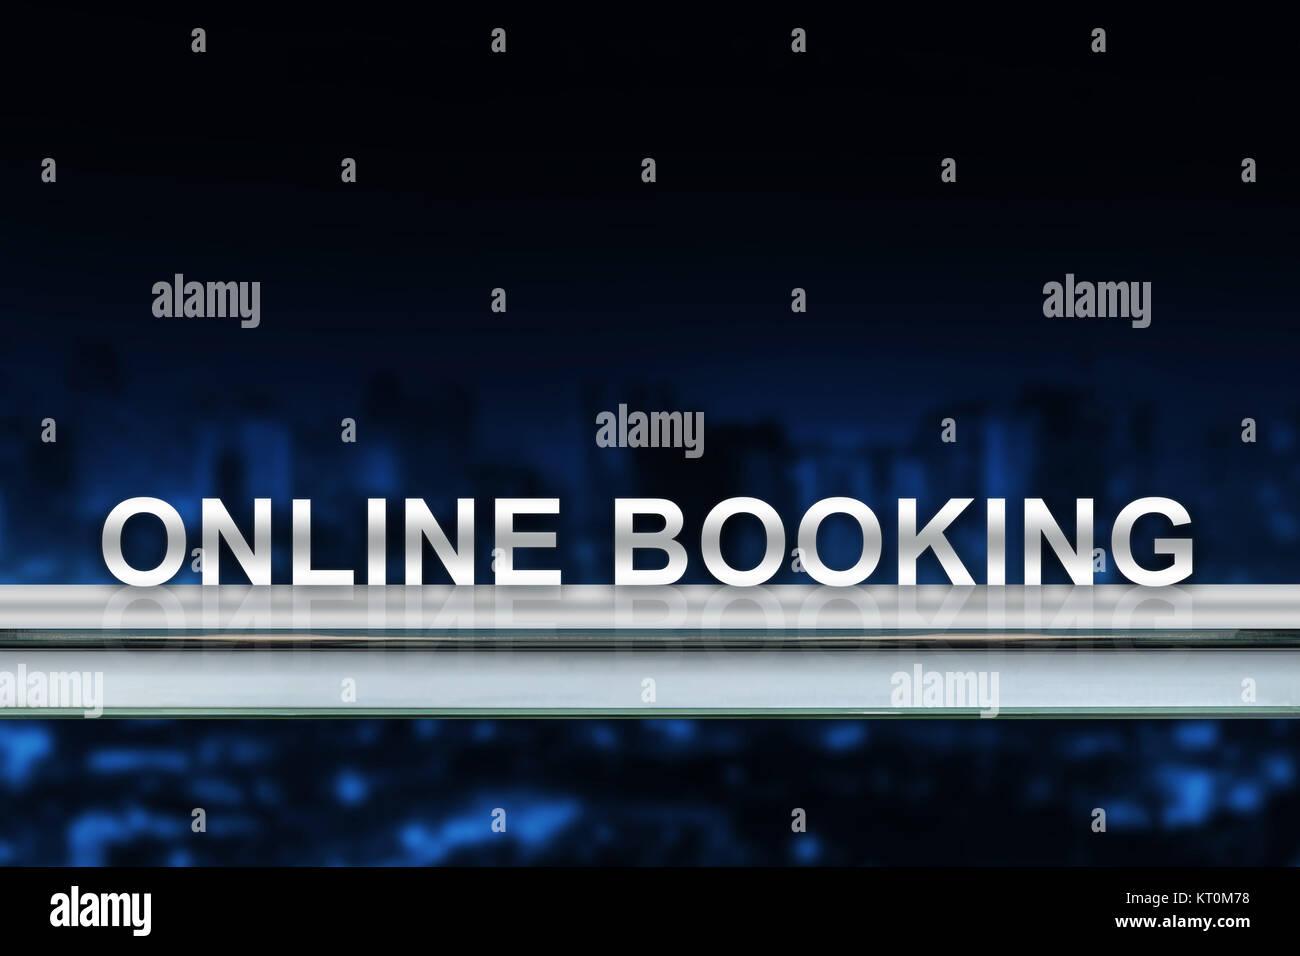 online booking on metal railing - Stock Image